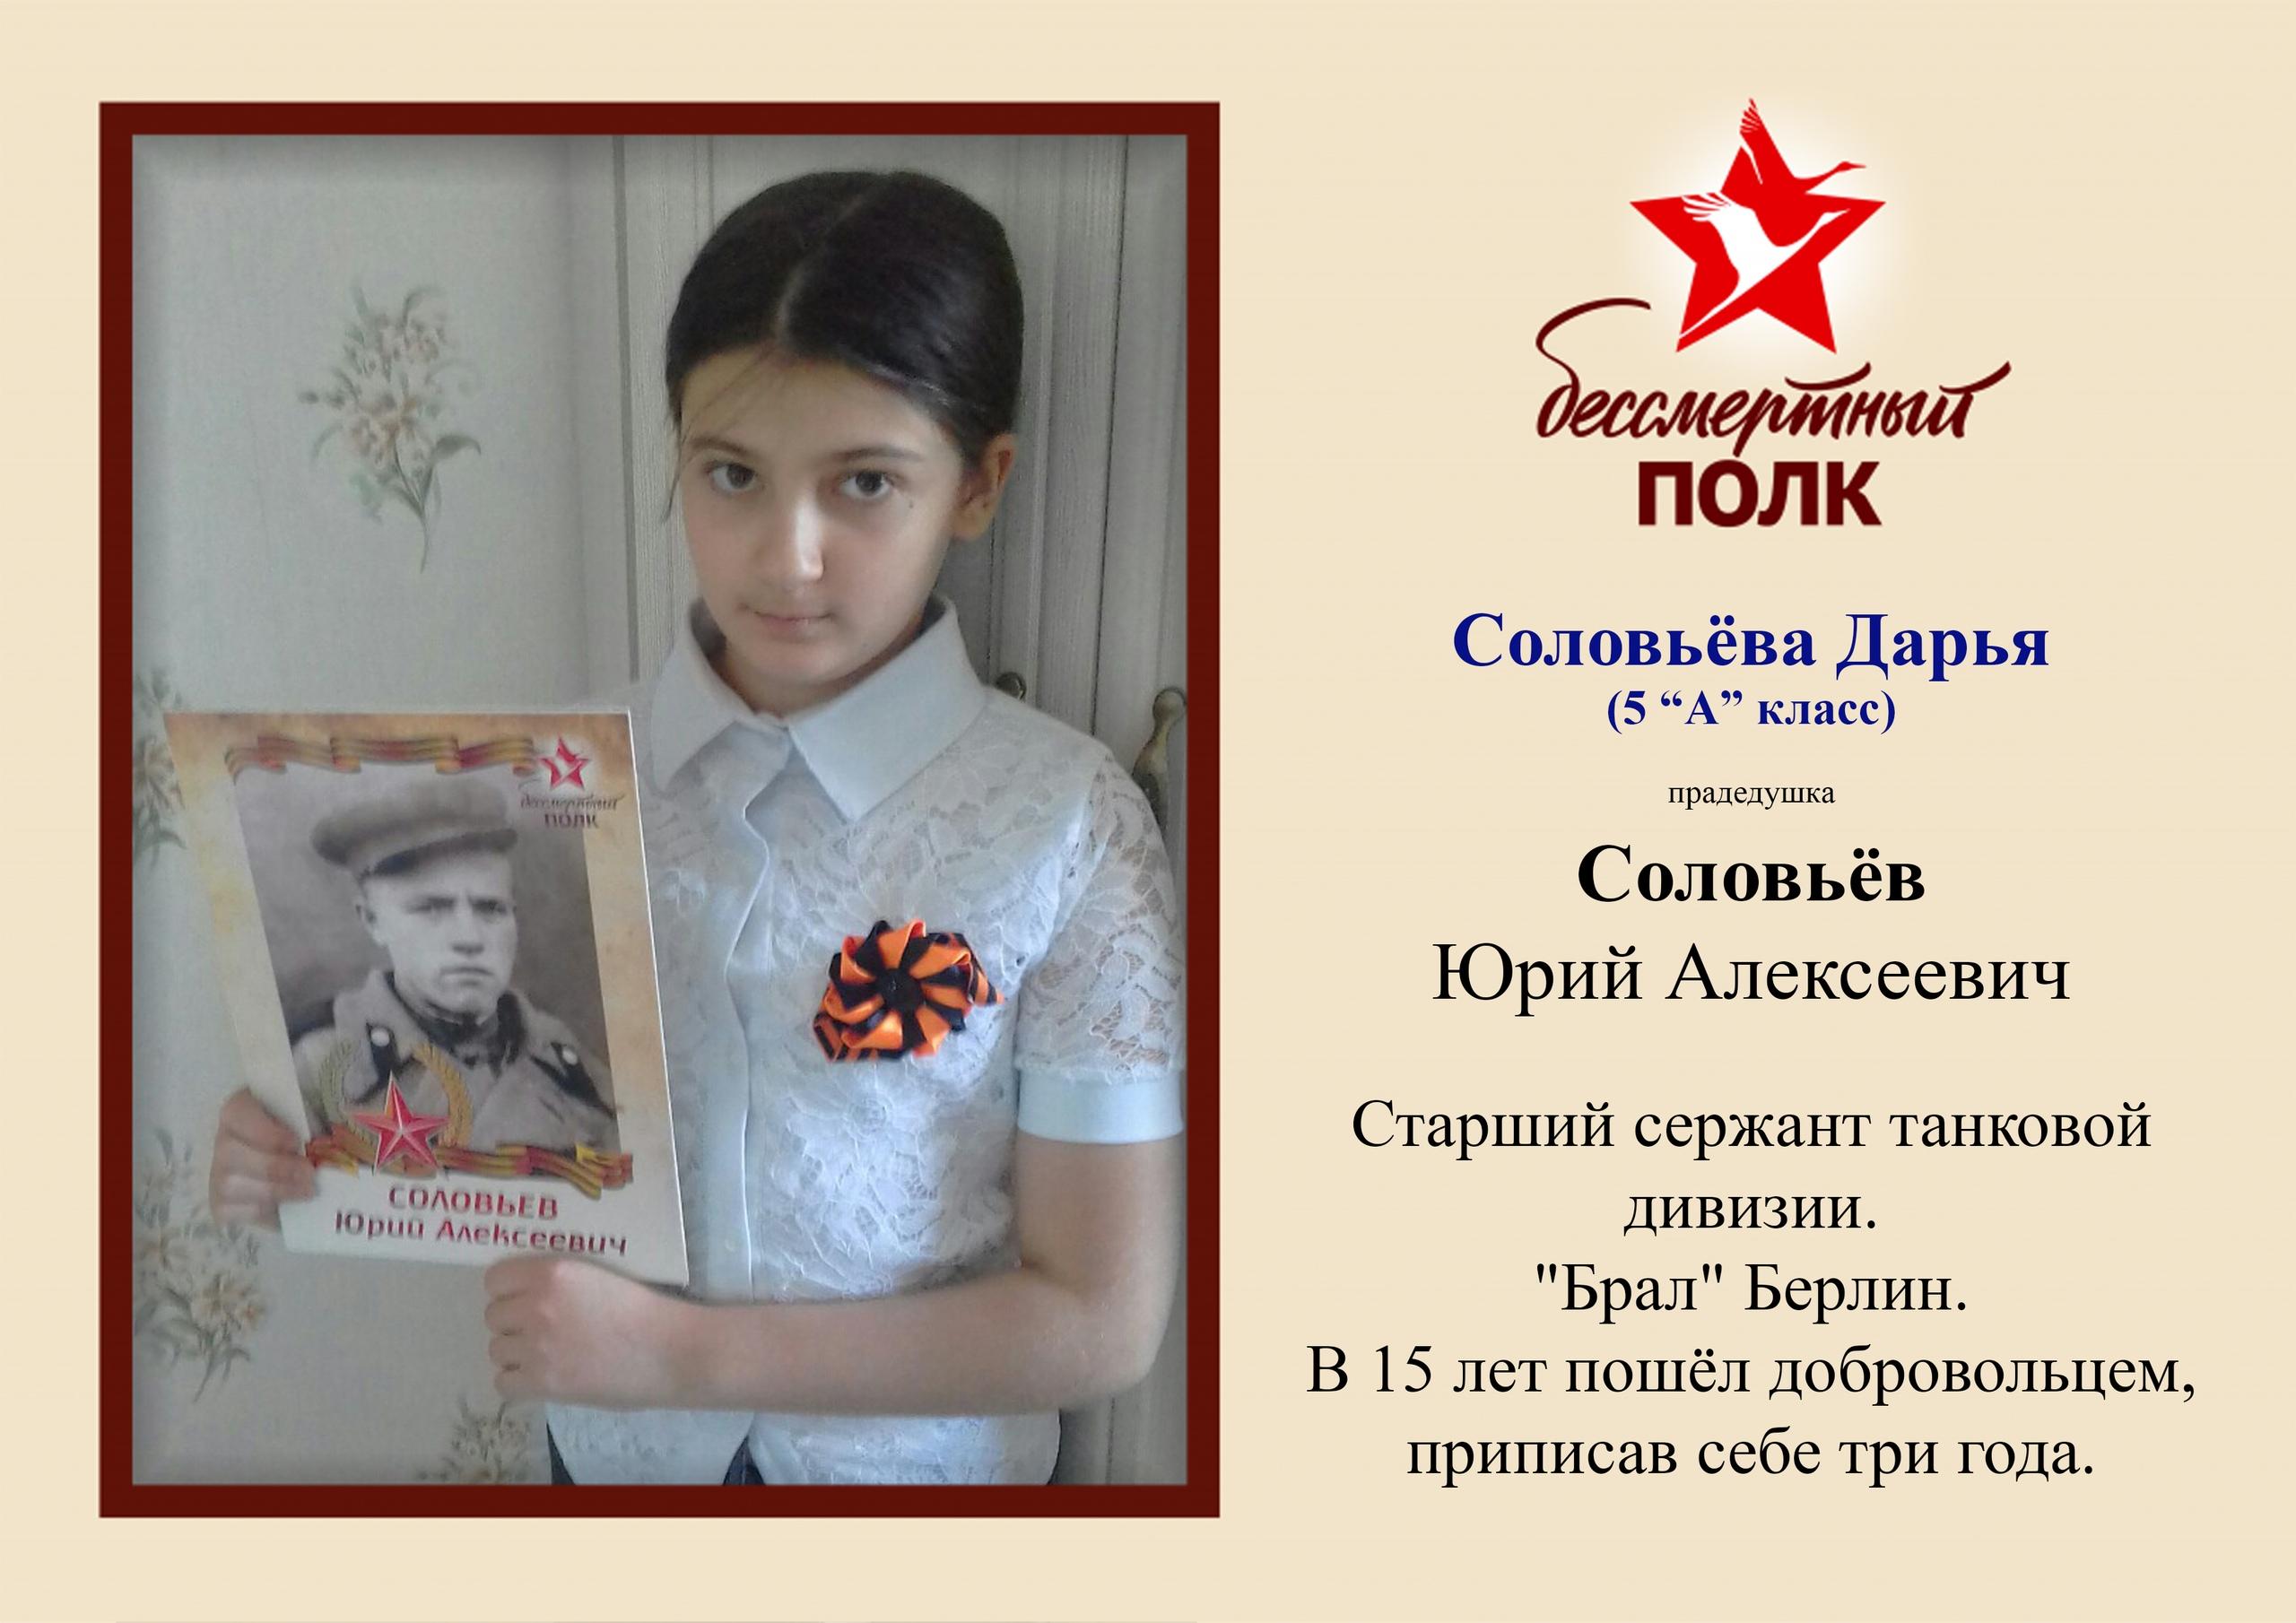 Соловьёва Дарья